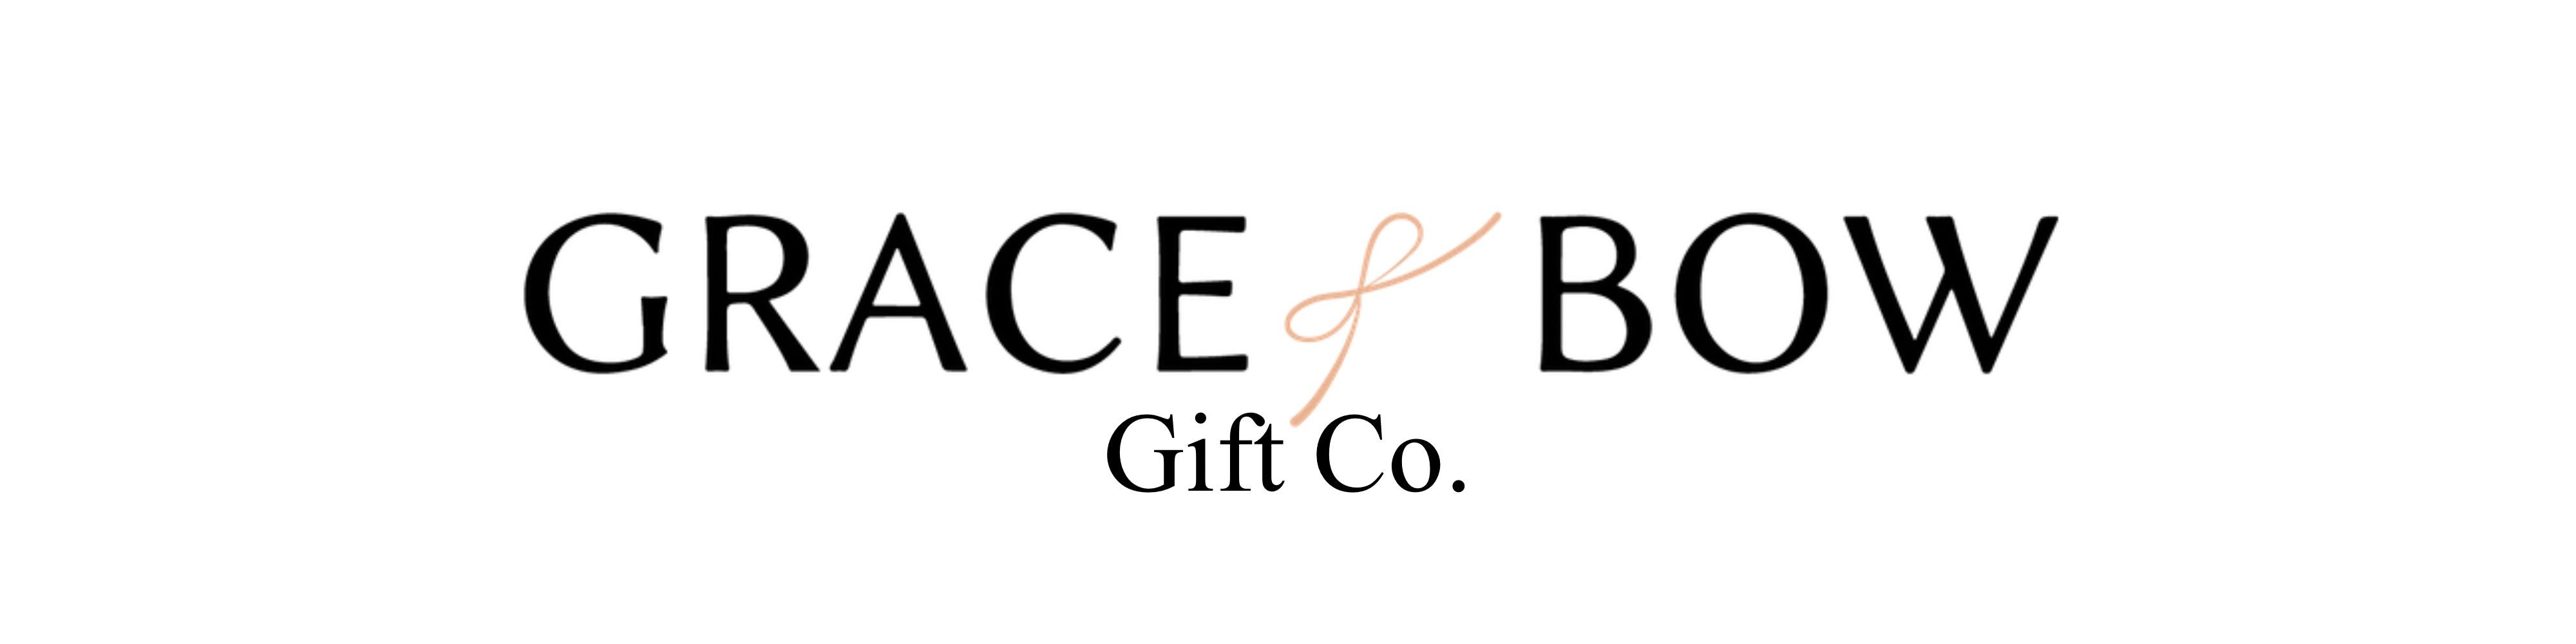 Grace & Bow logo